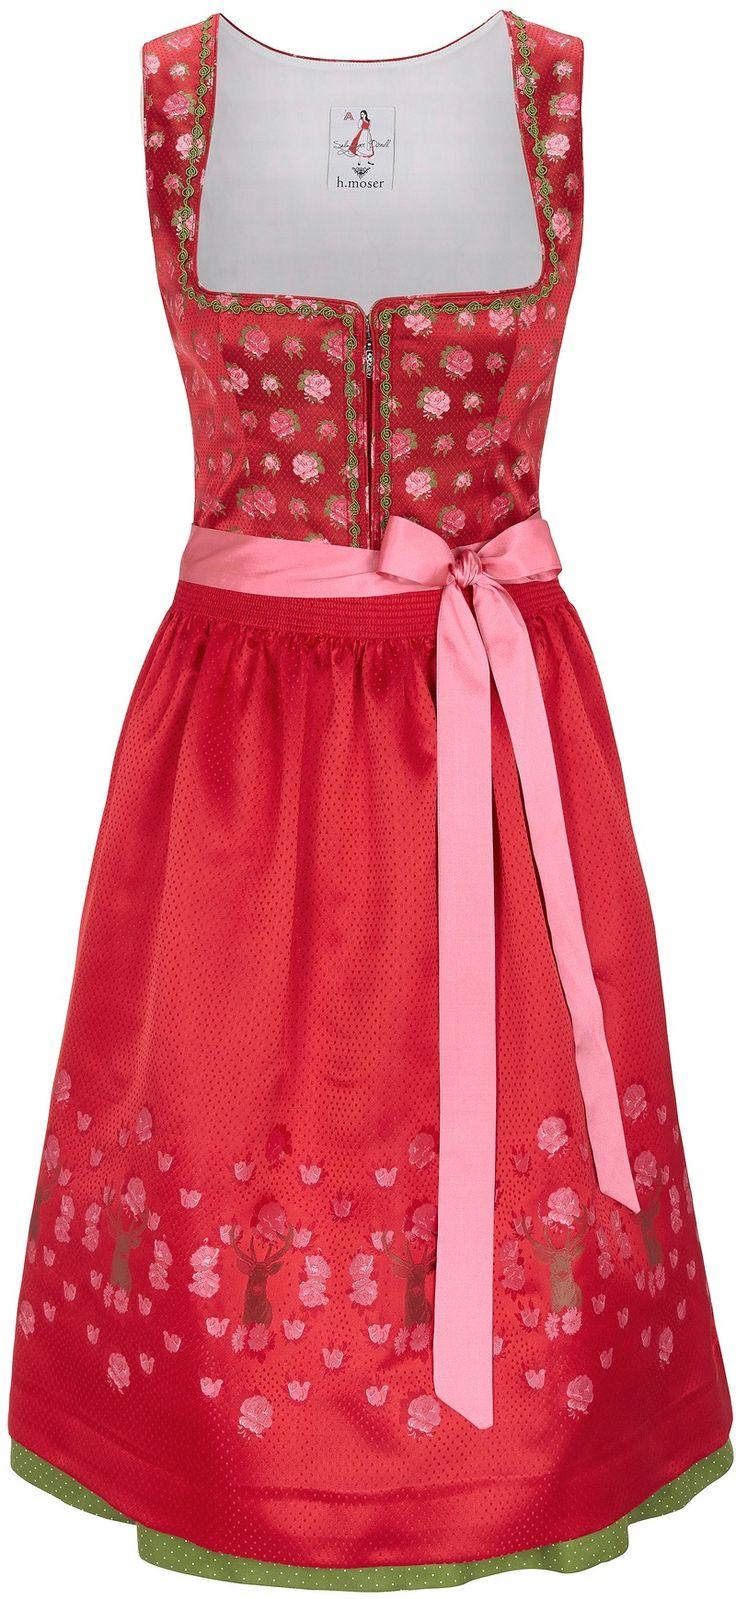 MOSER Dirndl rot online kaufen bei Trachten Modewelt > KRÜGER Kleidung